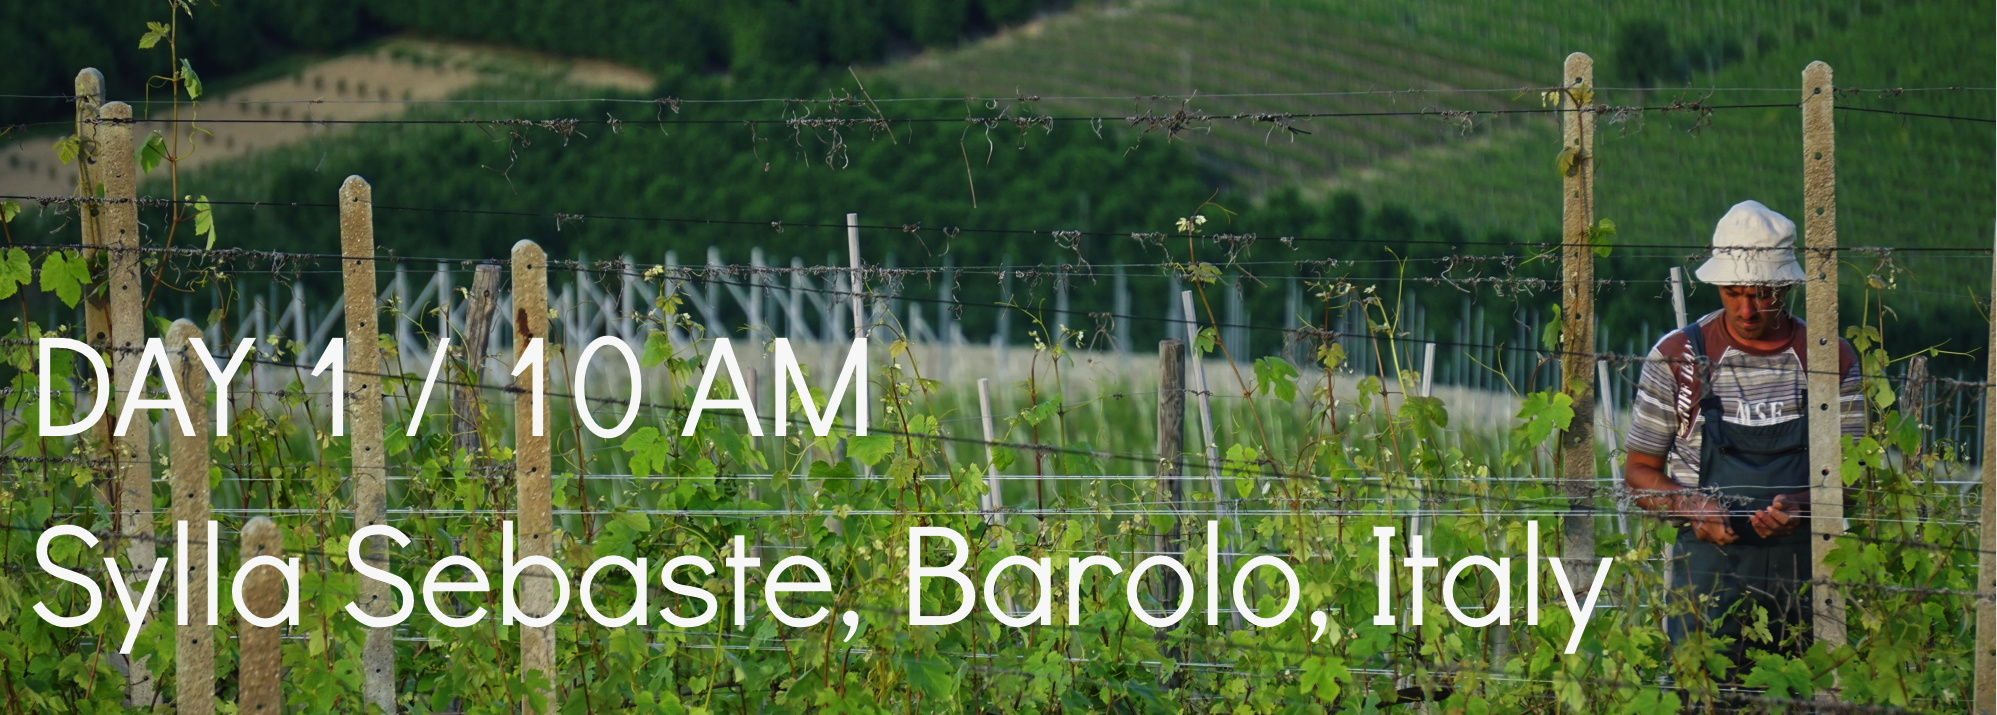 sylle_sebaste_fabrizio_merlo_cover